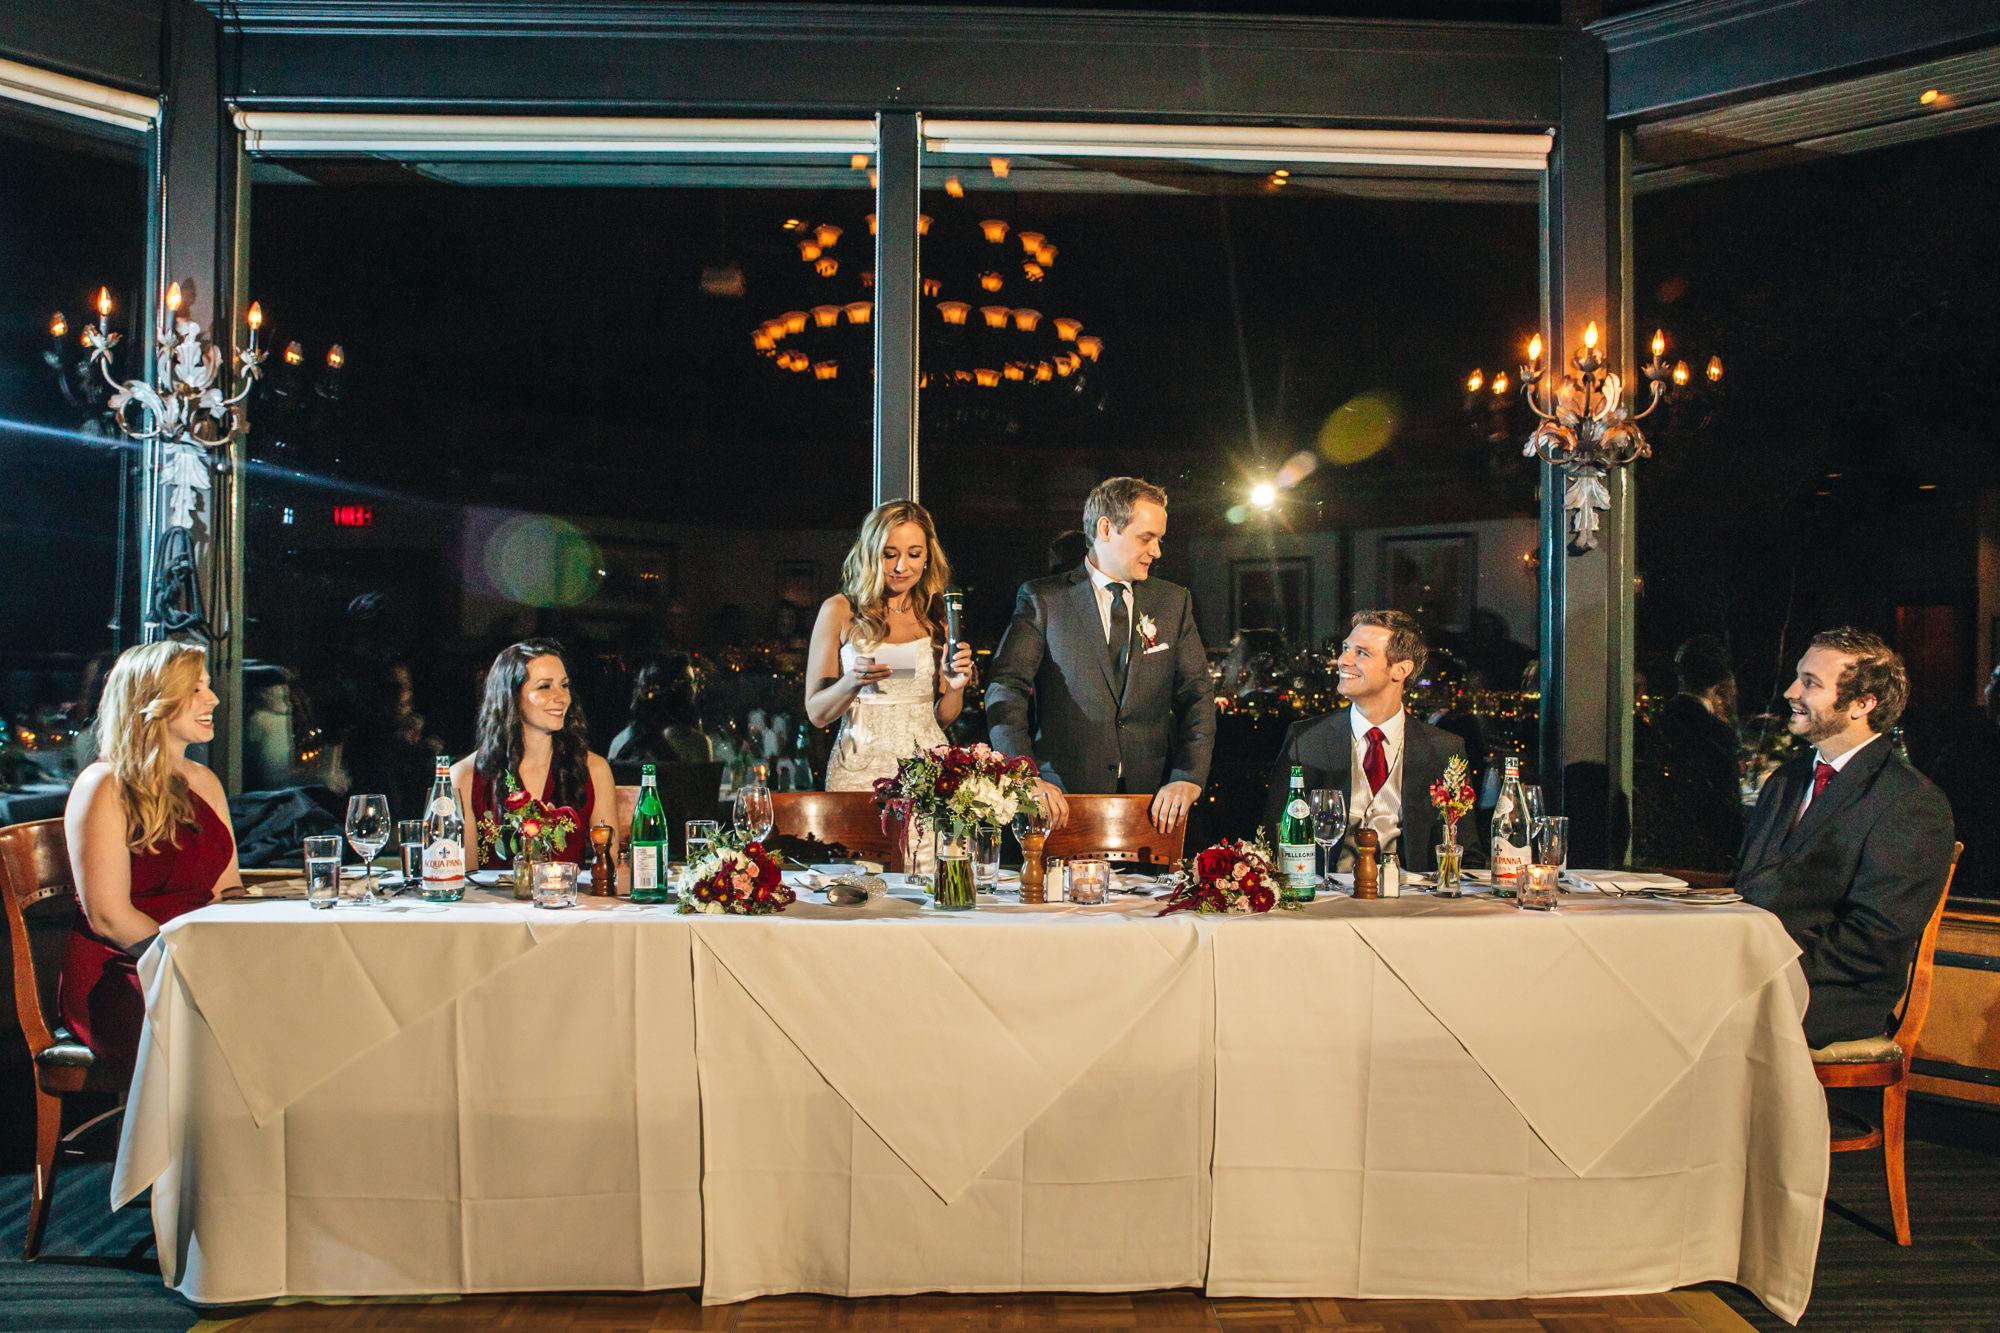 55-seasons-in-the-park-wedding-reception.jpg